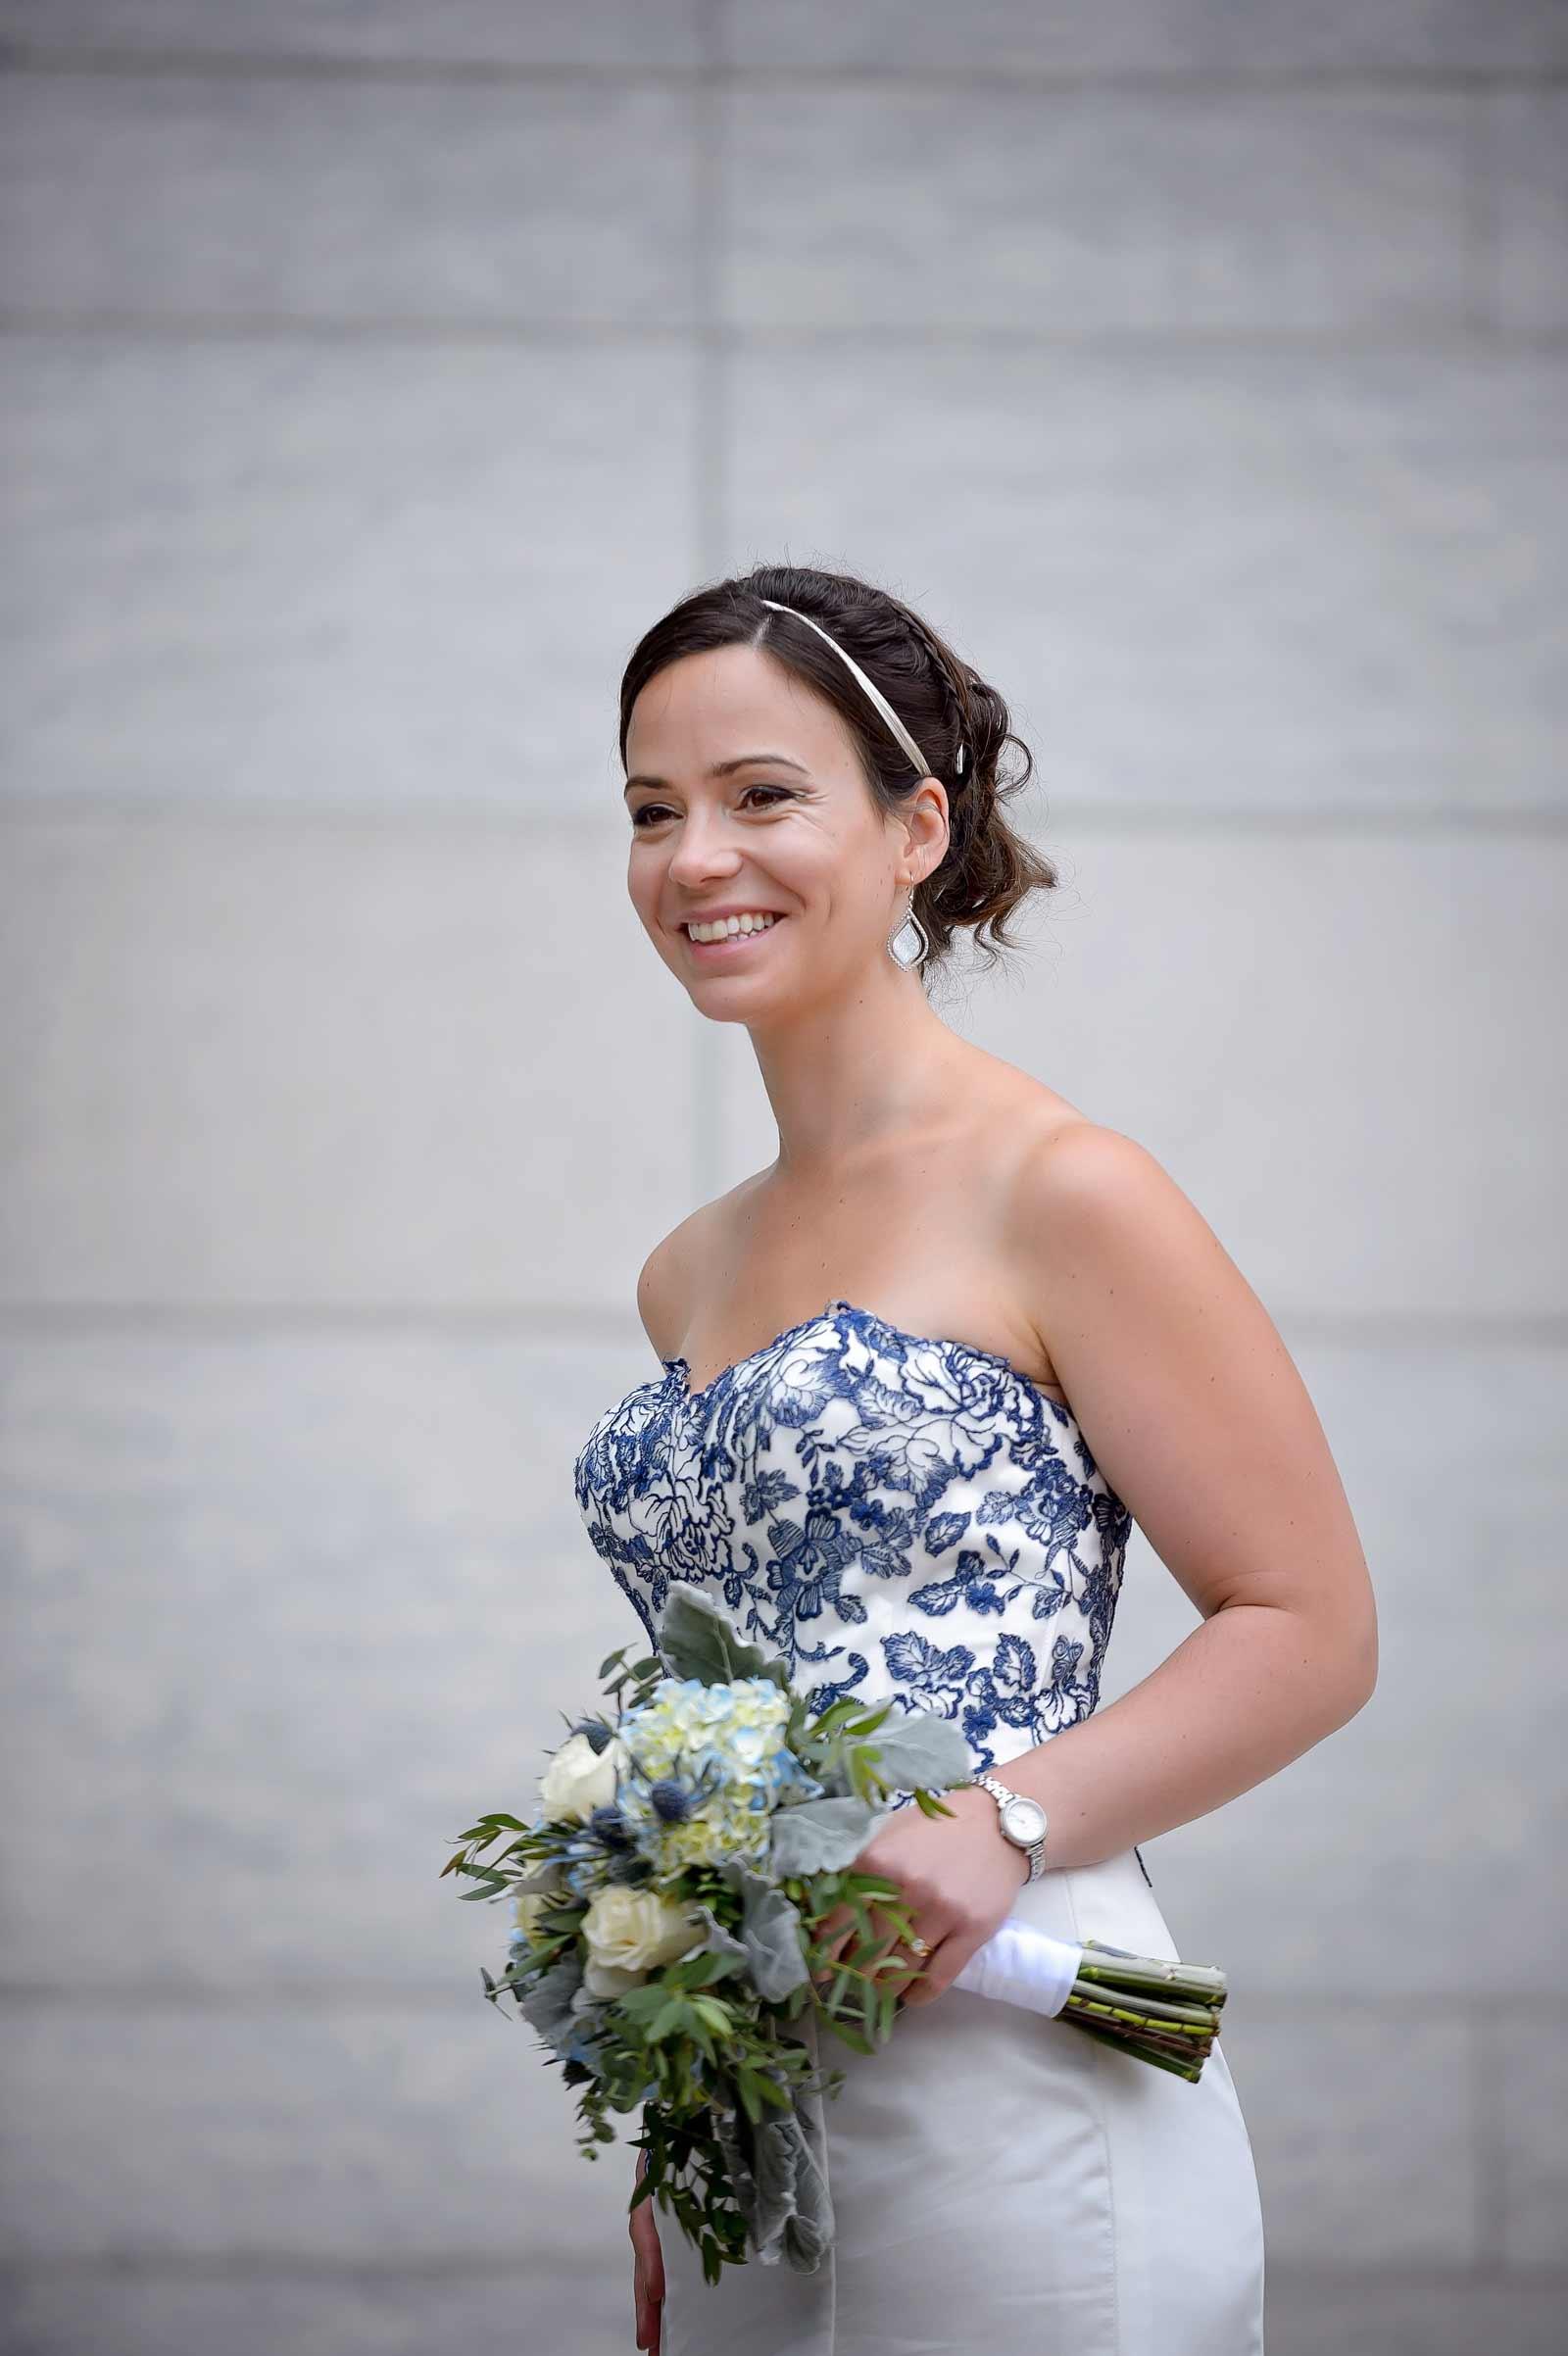 SamanthaBrian-wedding-sneakpeek-10